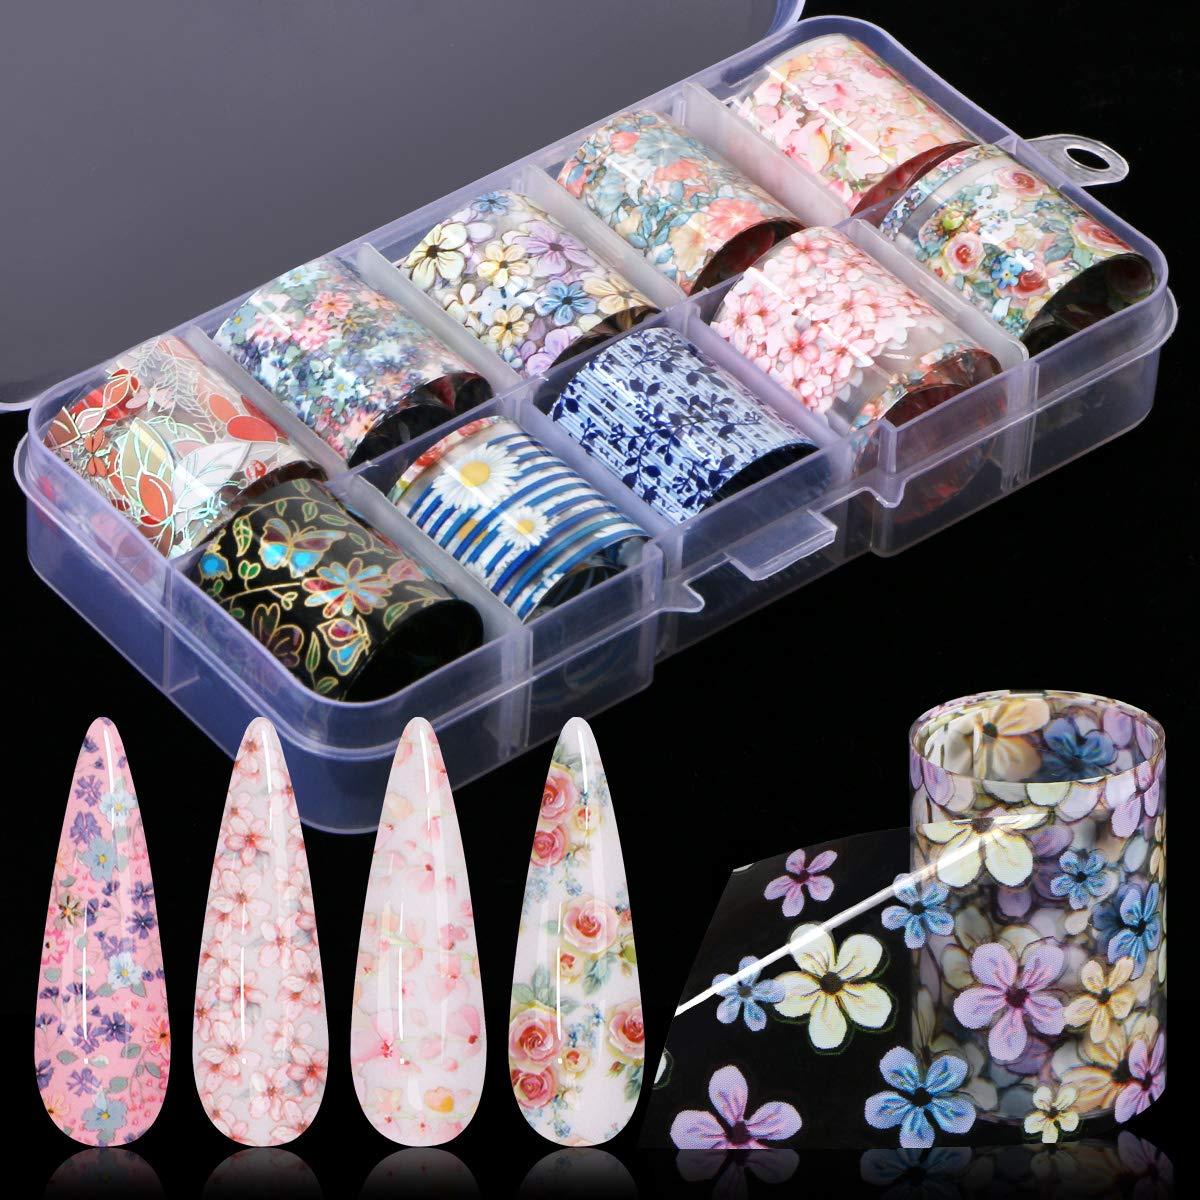 30 Color Nail Foil Transfer Sticker, Kissbuty Flower Nail Art Stickers Tips Wraps Foil Transfer Adhesive Glitters Acrylic DIY Nail Decoration, 3 Boxes (Flowers Starry Sky): Beauty